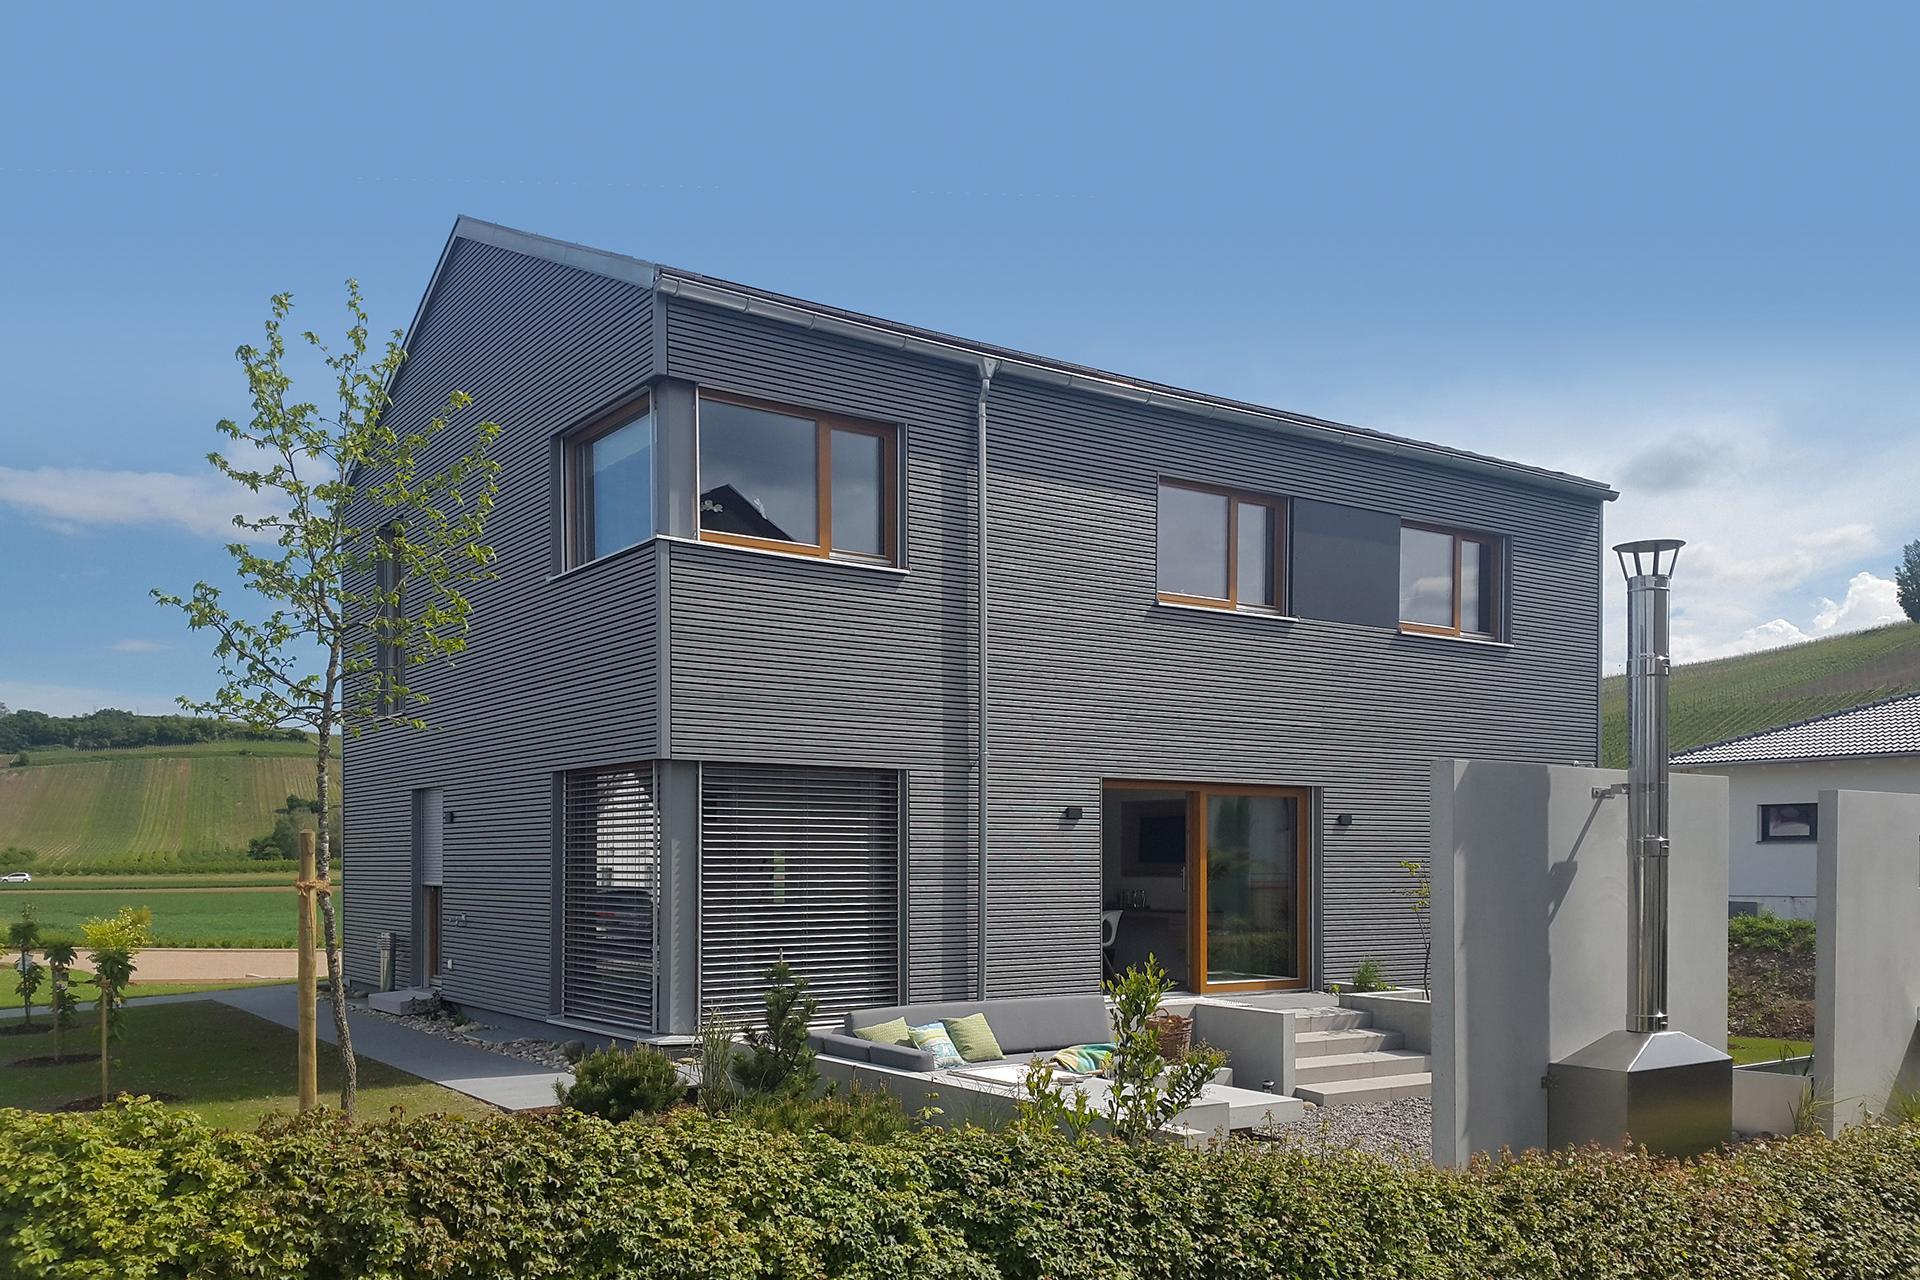 Rivestimento Casa In Legno casa con rivestimento in legno | e 20-180.5 | schwörerhaus